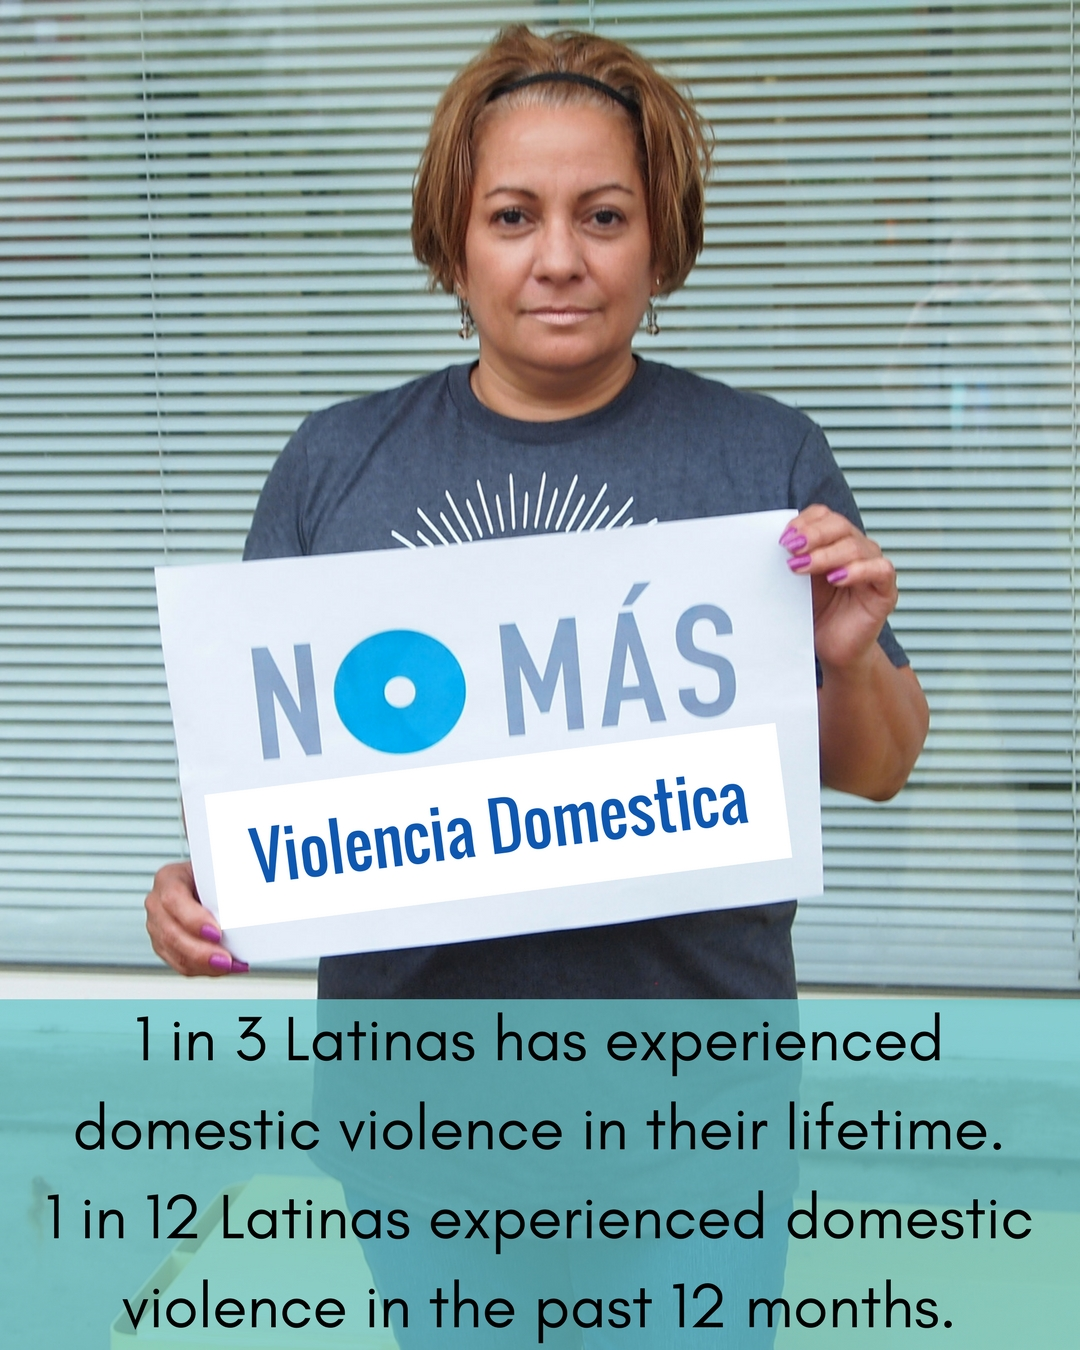 No More Campaign-No Mas Violencia Domestica